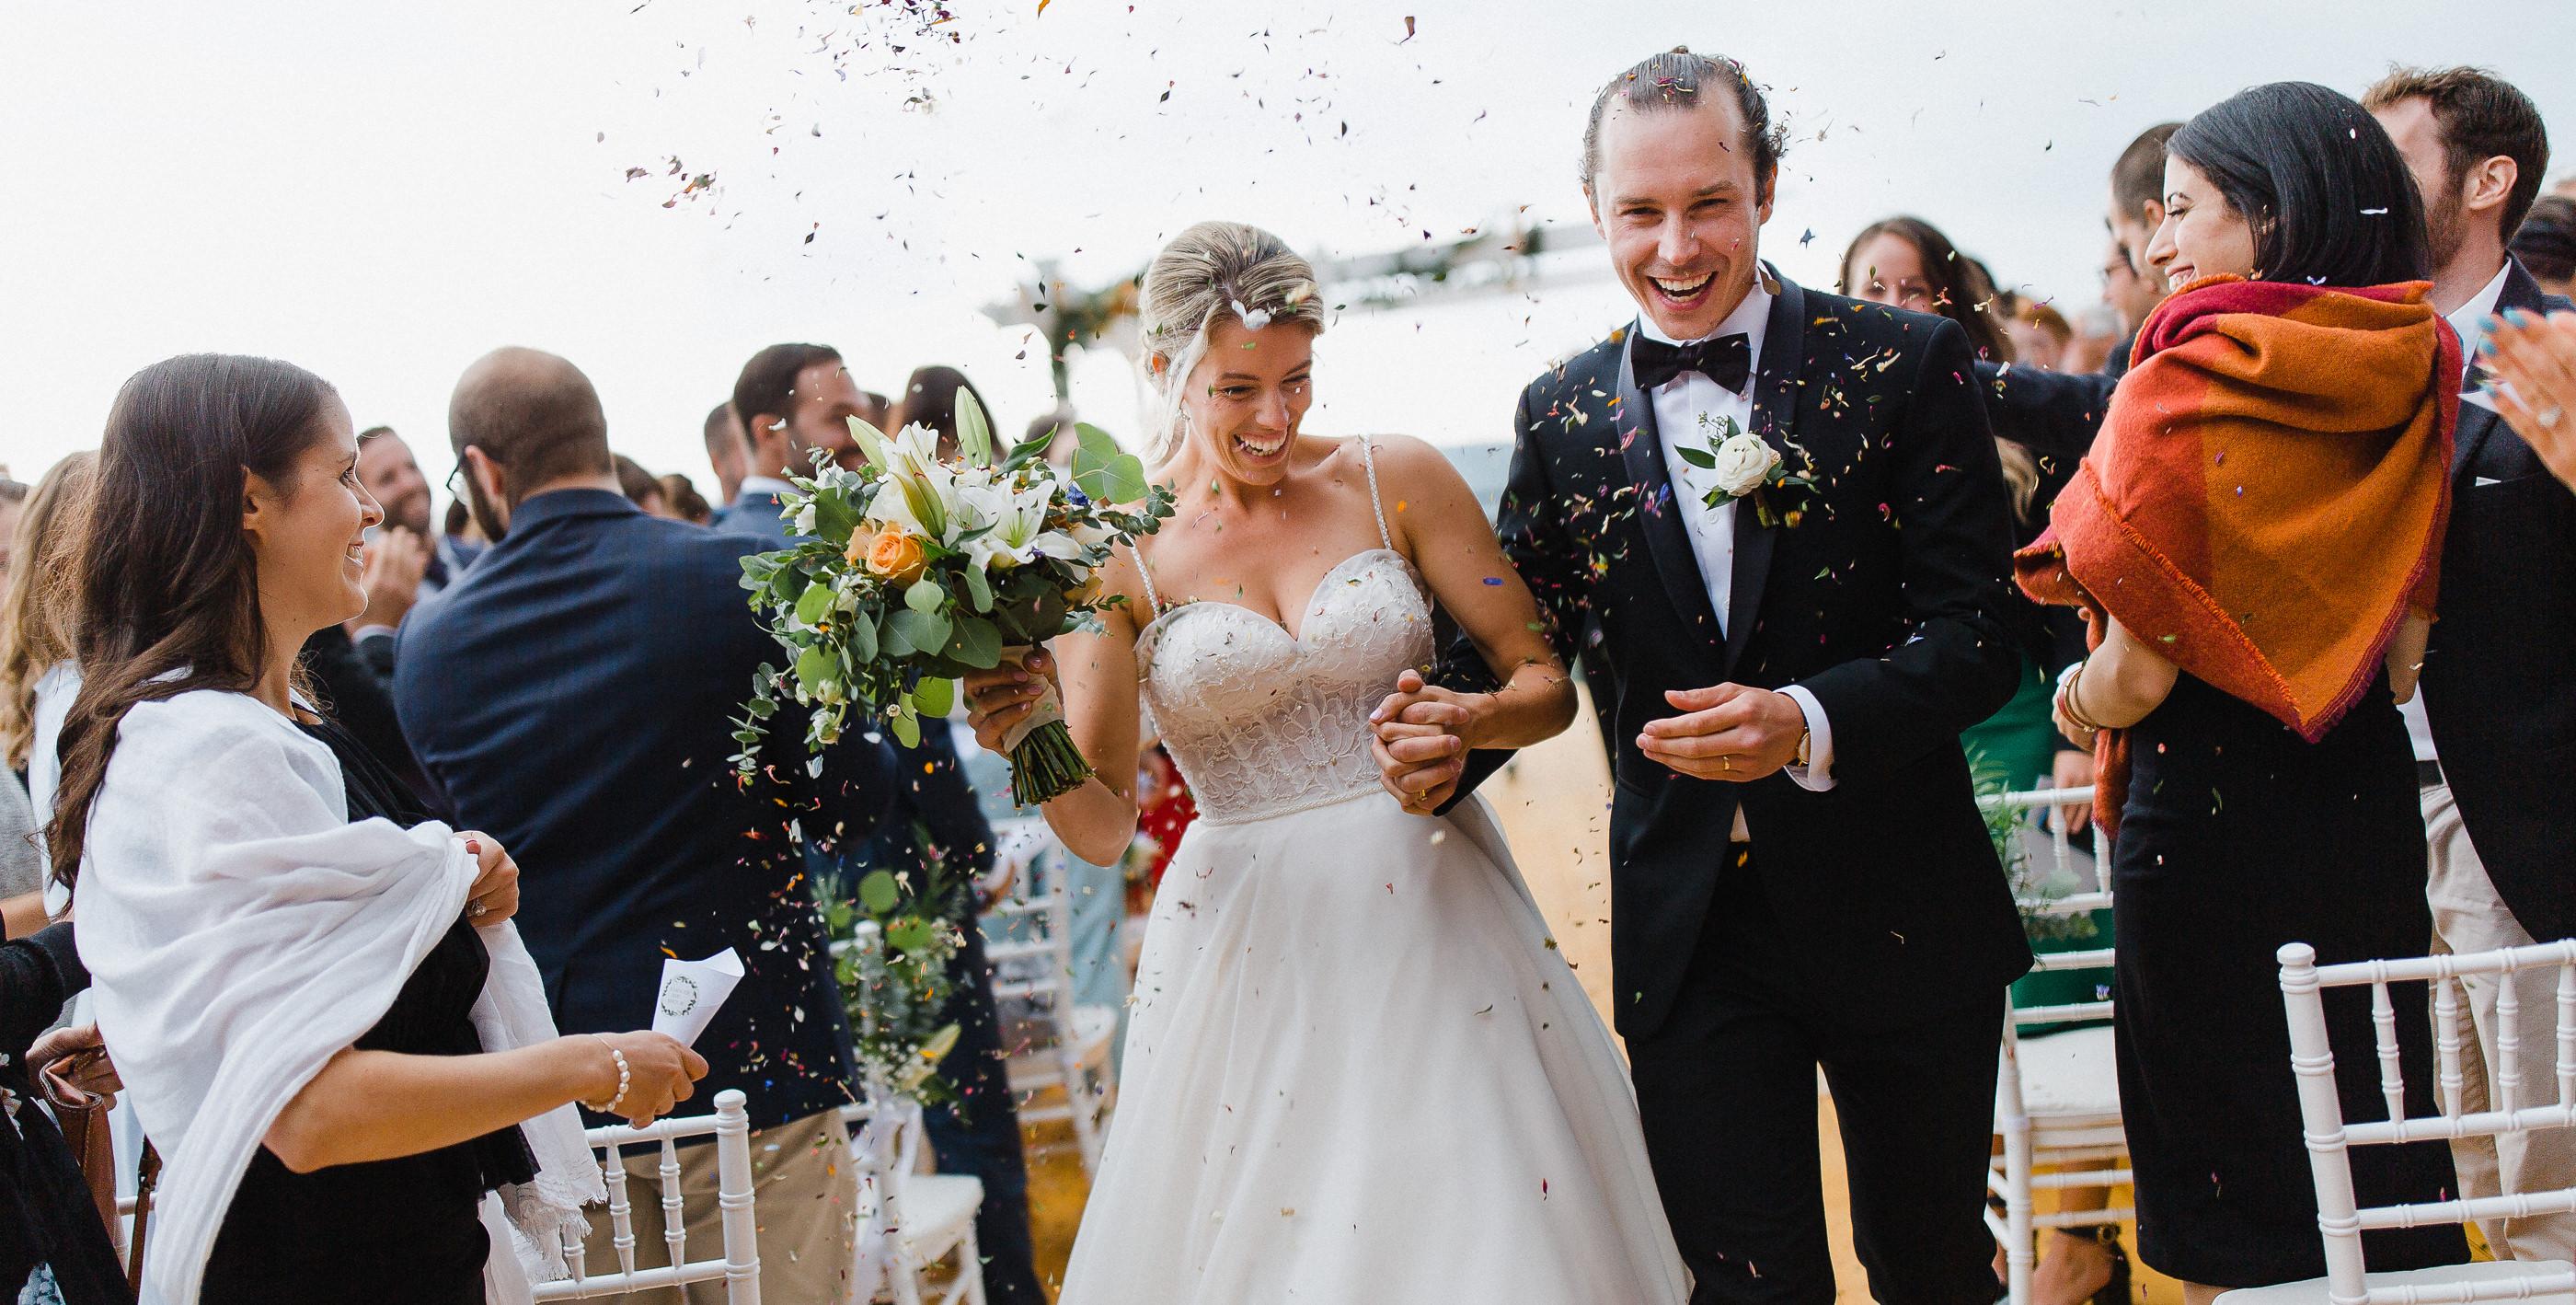 portfolio-photographies-de-mariage-sonia-bourdon-026